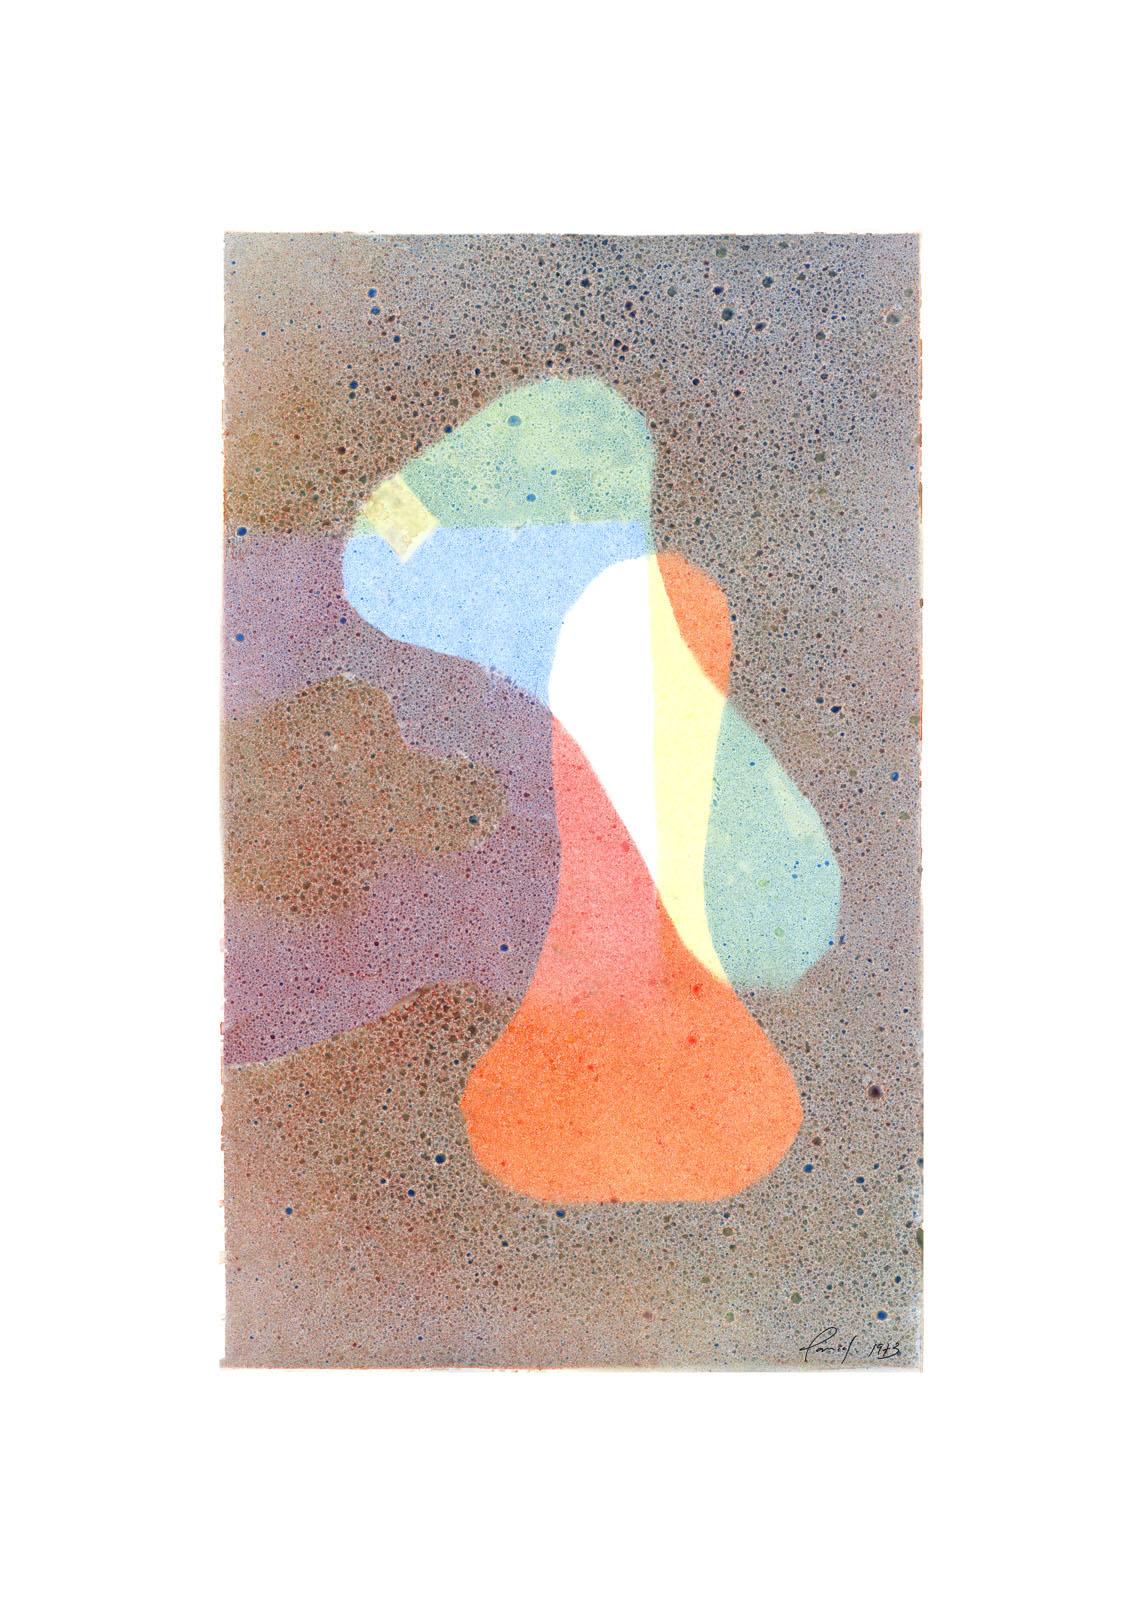 panies-danielvillalobos-spanish-painting-abstract-19